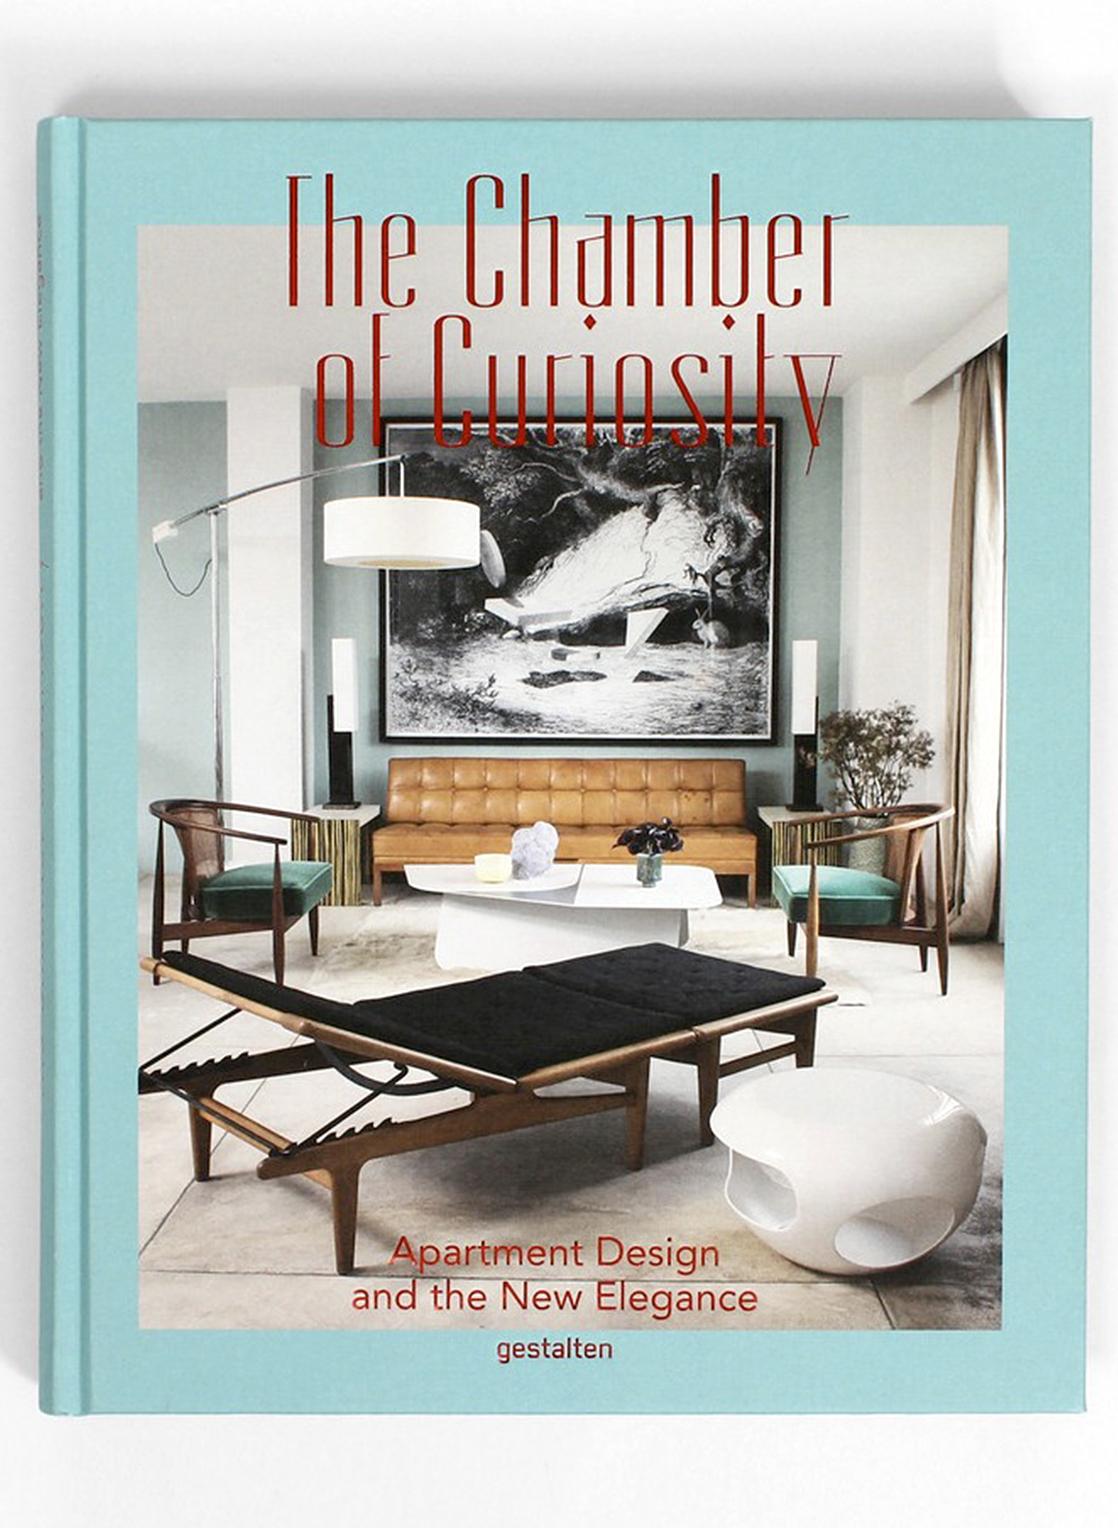 chamber-of-curiosity-1b